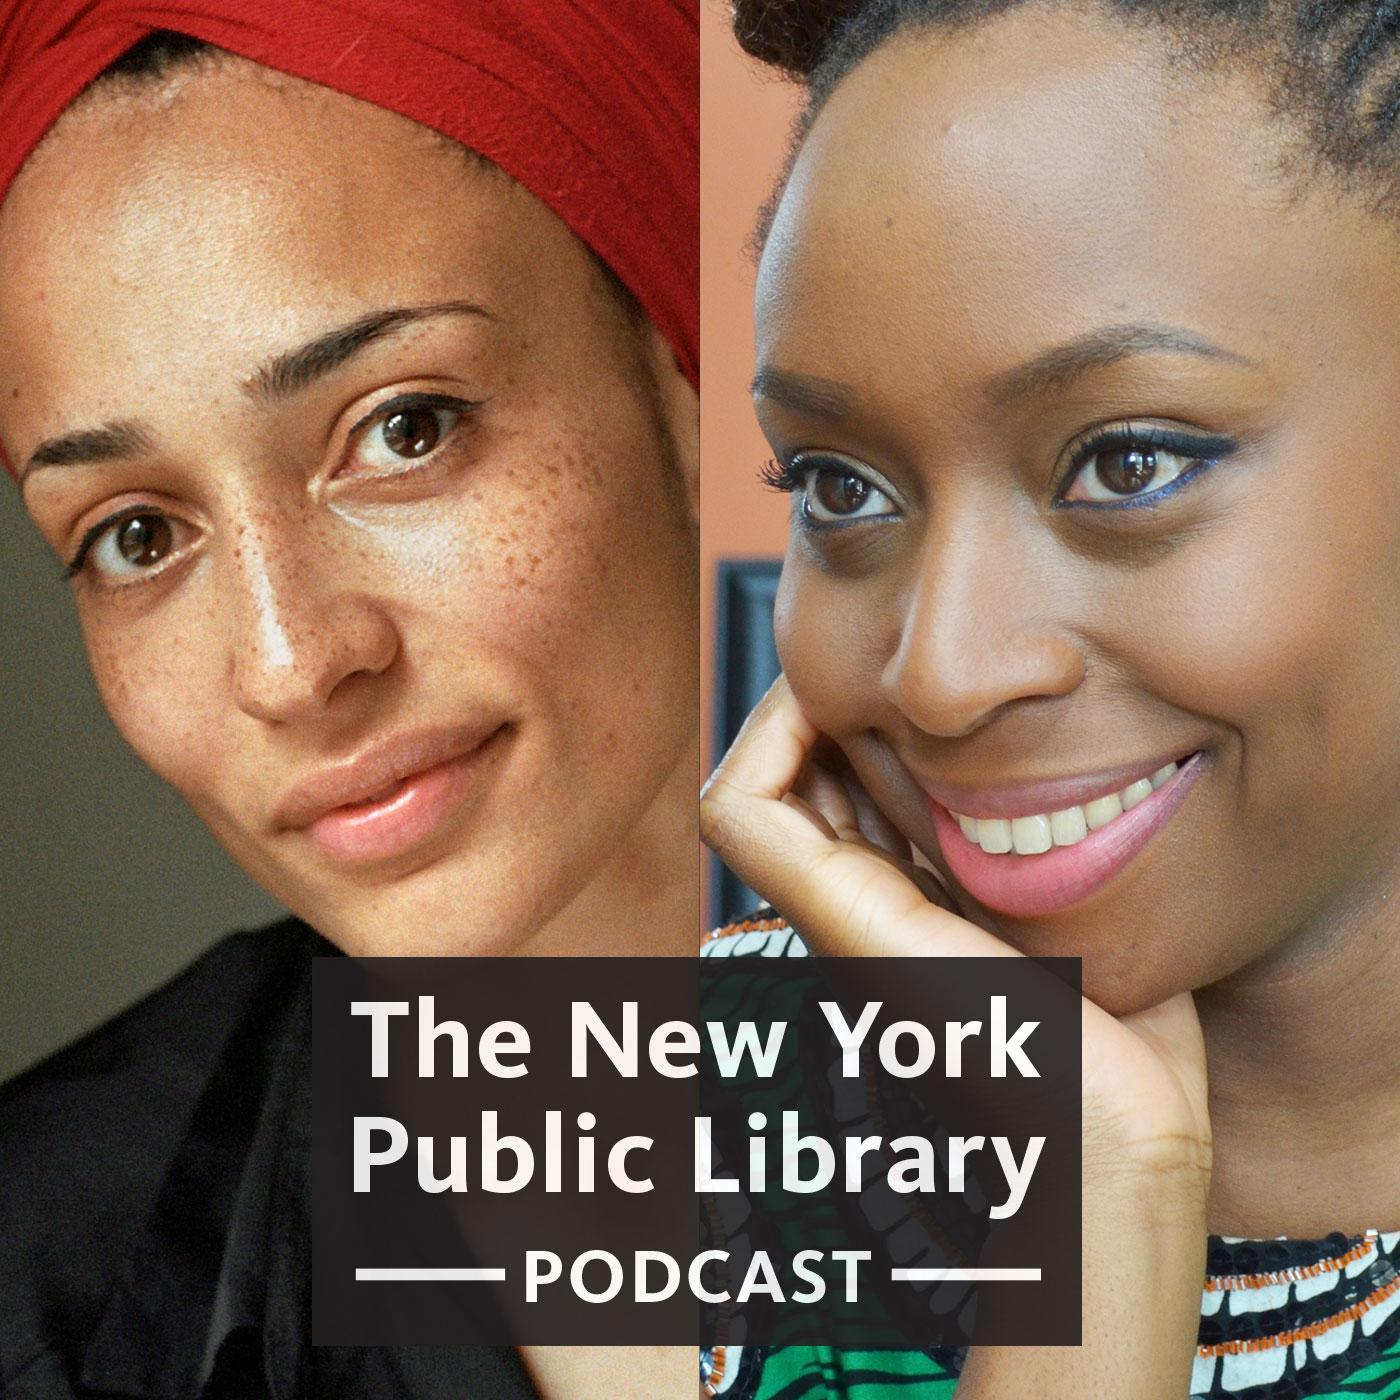 Chimamanda Adichie & Zadie Smith on Race, Writing, & Relationships